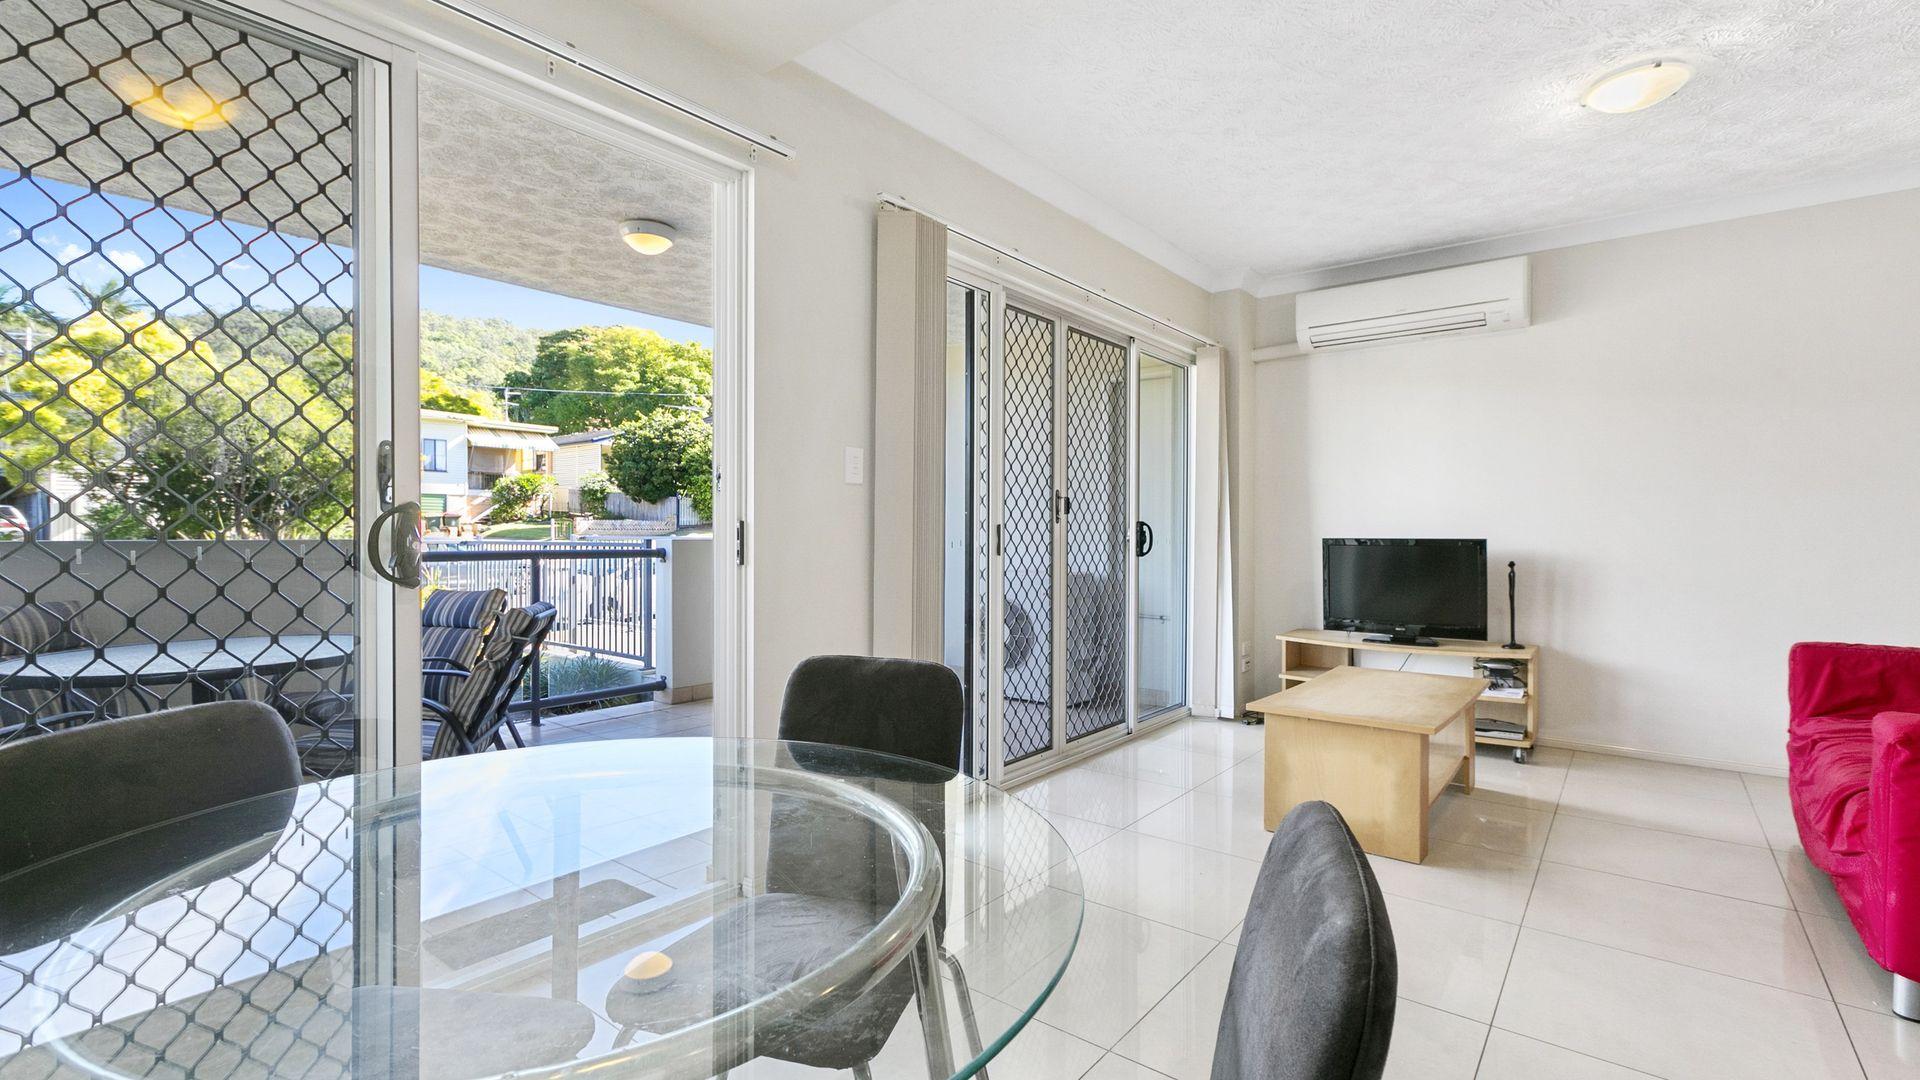 1/84 Tenby Street, Mount Gravatt QLD 4122, Image 1